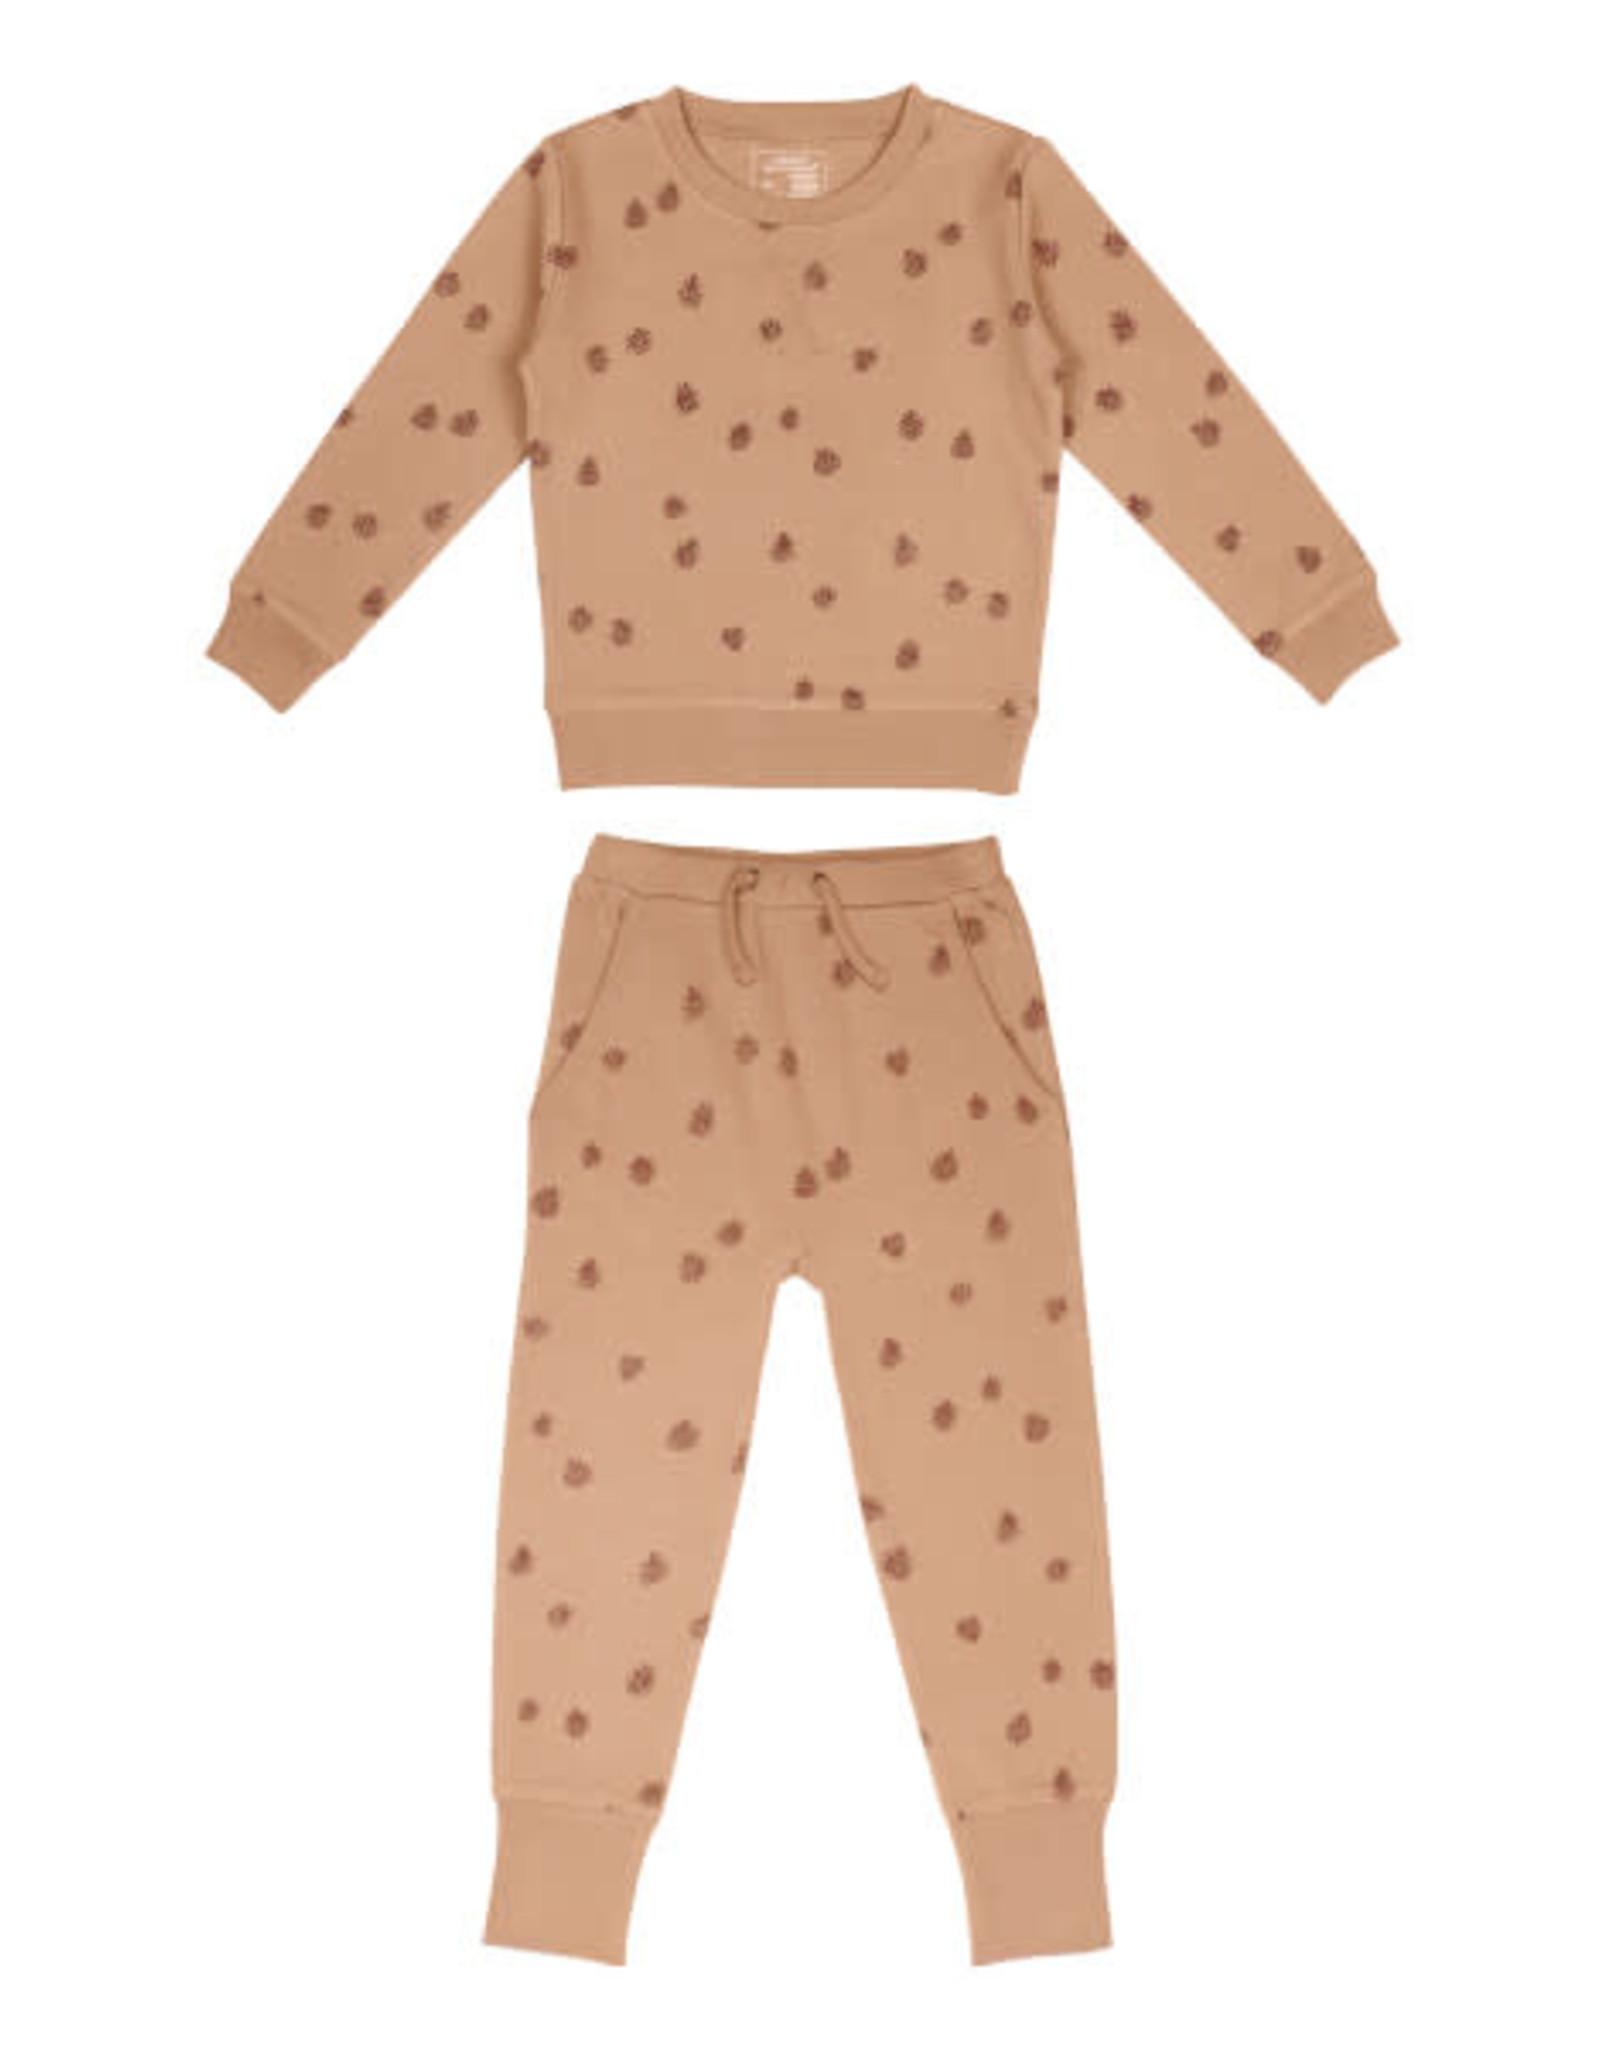 L'oved Baby Kids Nutmeg Sweatshirt & Jogger Set with Pinecone Print